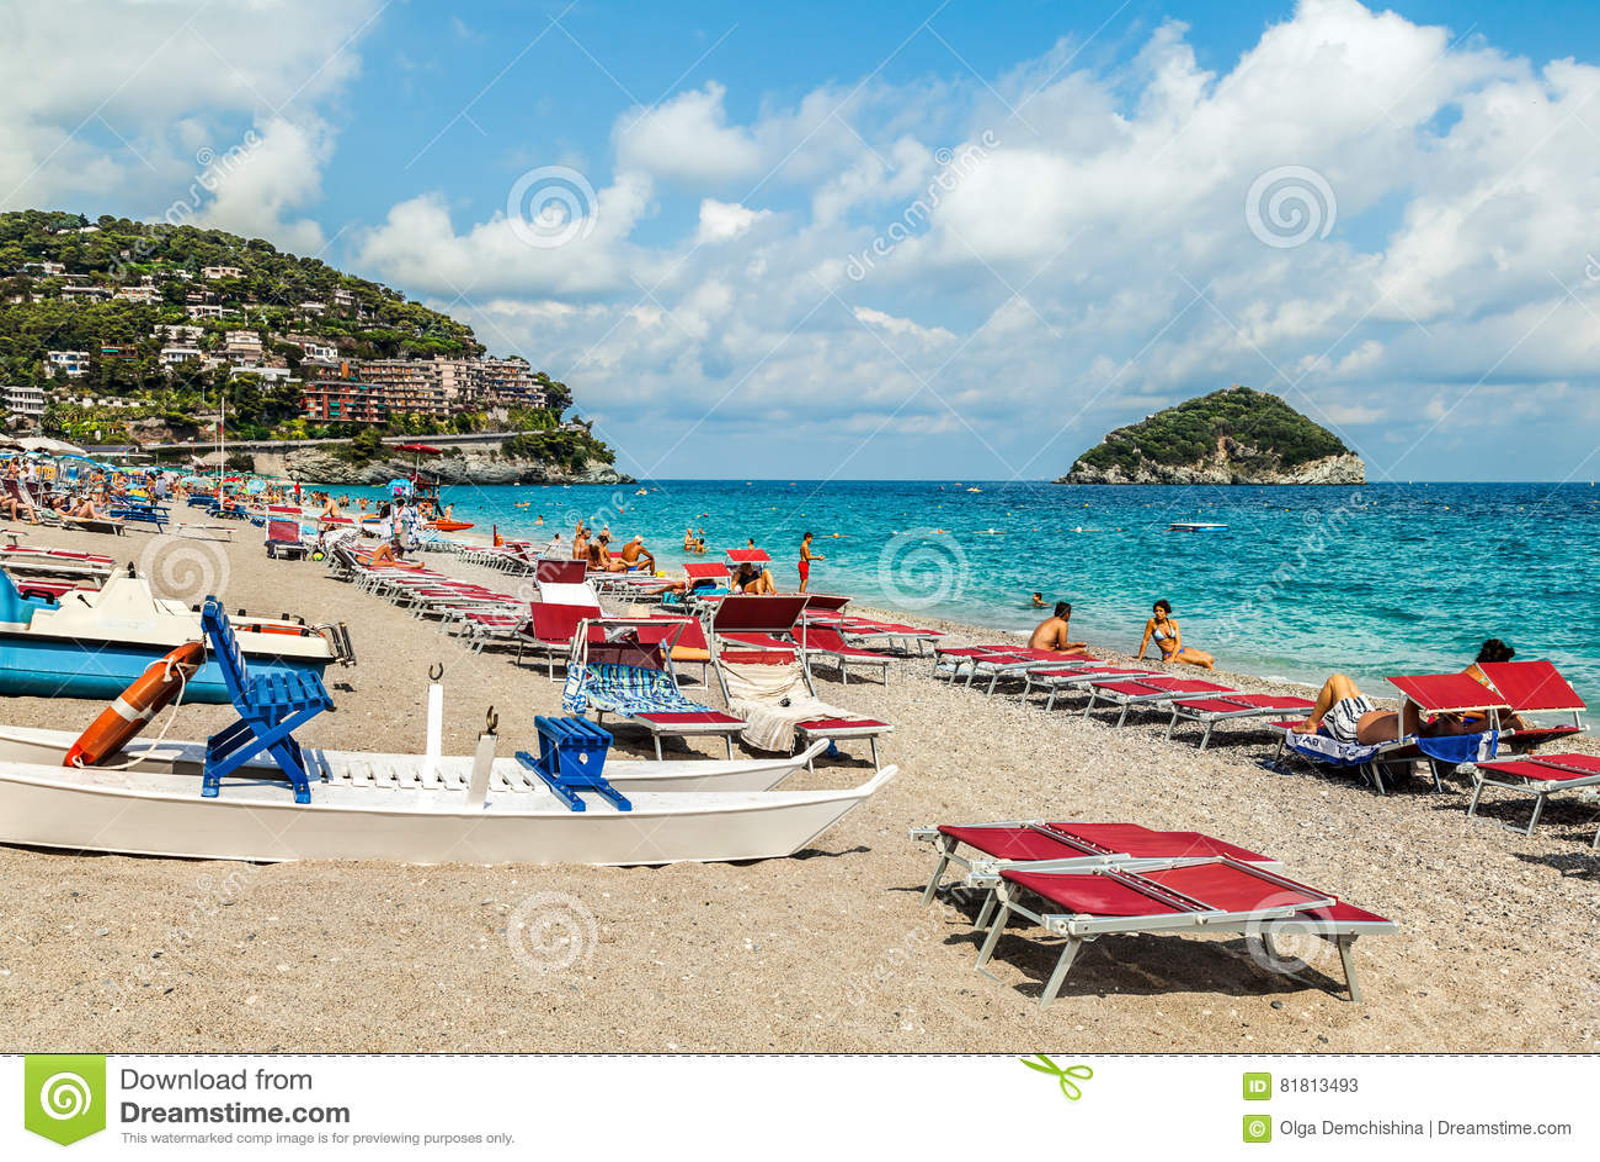 Пляж Spotorno, Италия